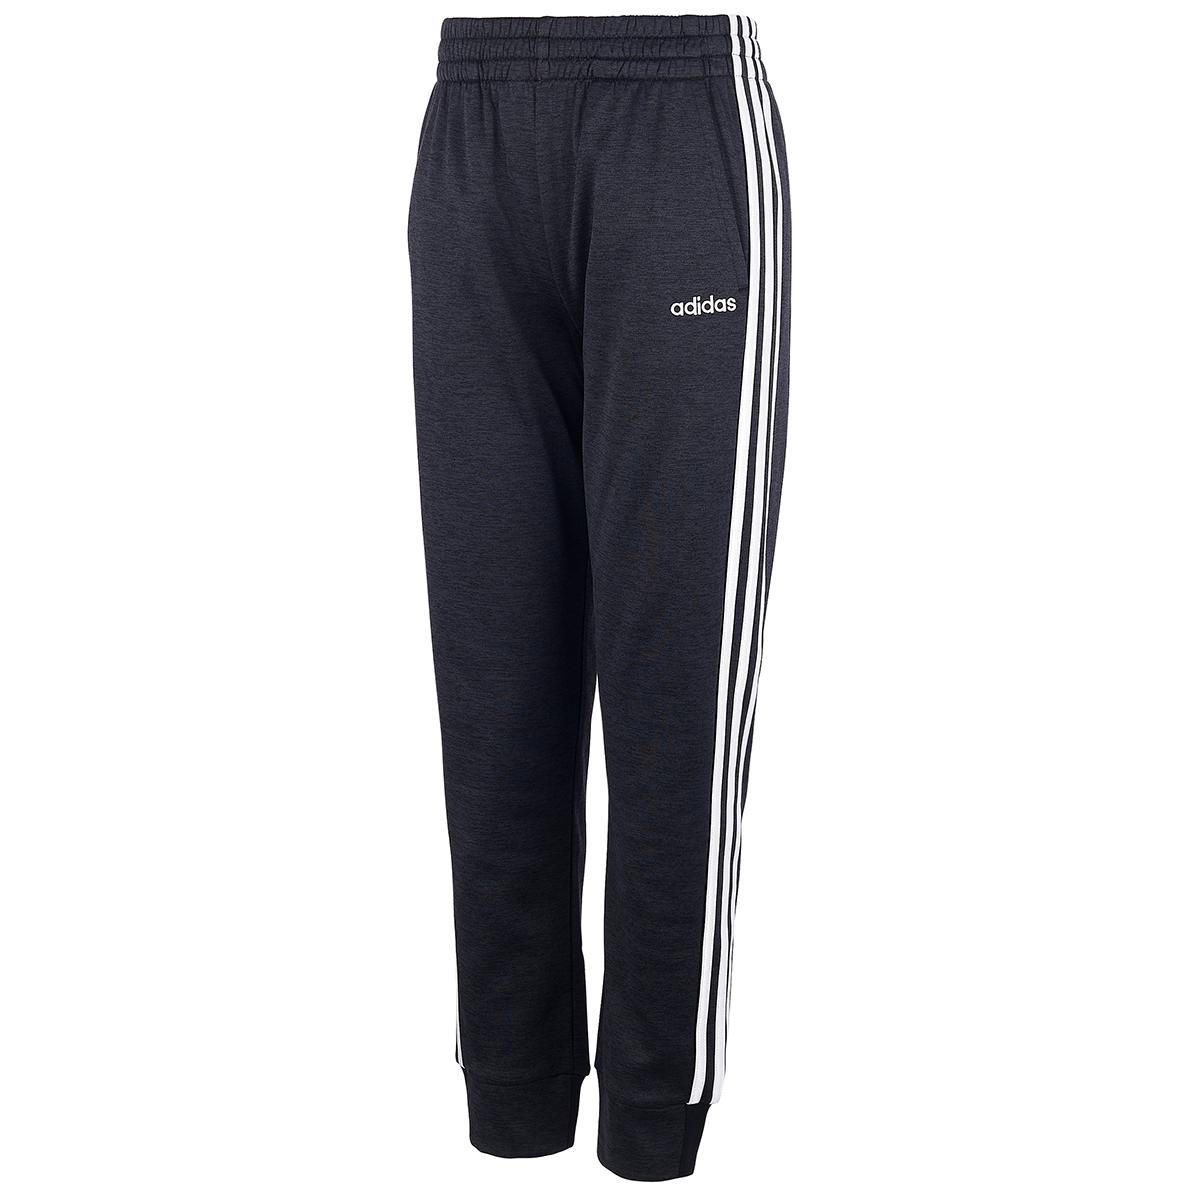 Adidas Boys' 8-20 Core Pants - Black, M